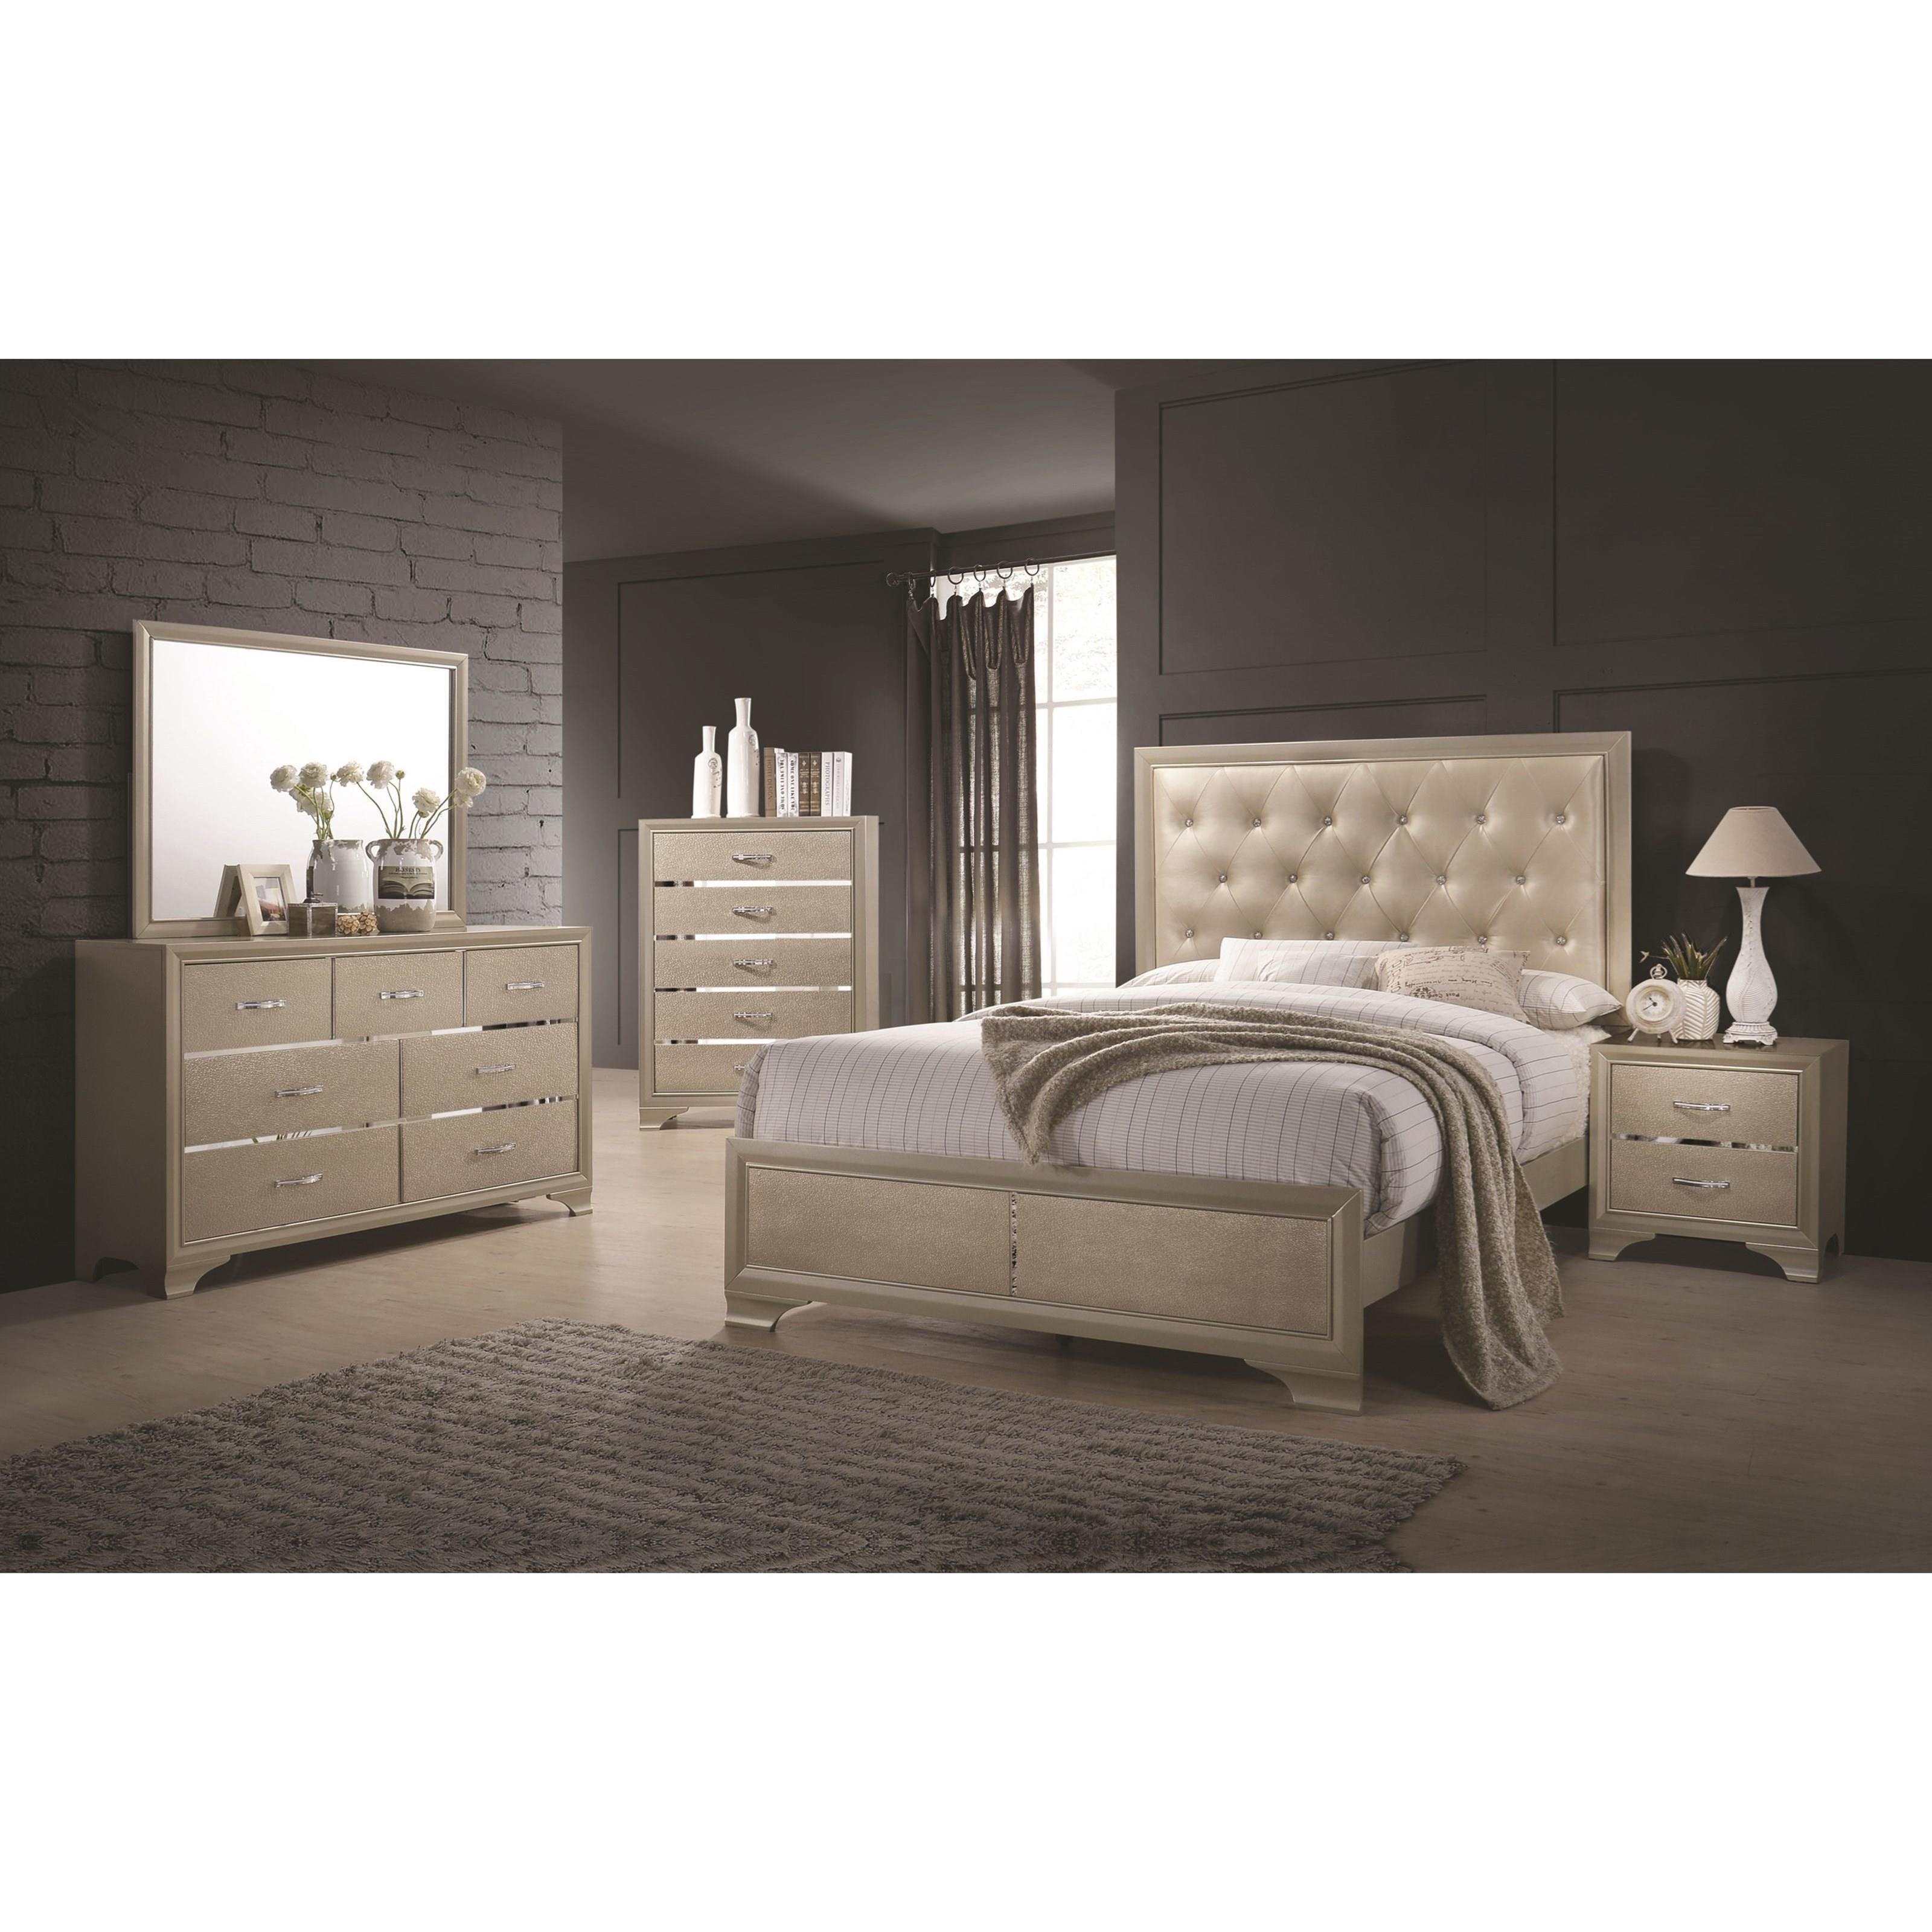 Fine Furniture Beaumont 205291KE Upholstered King Bed With